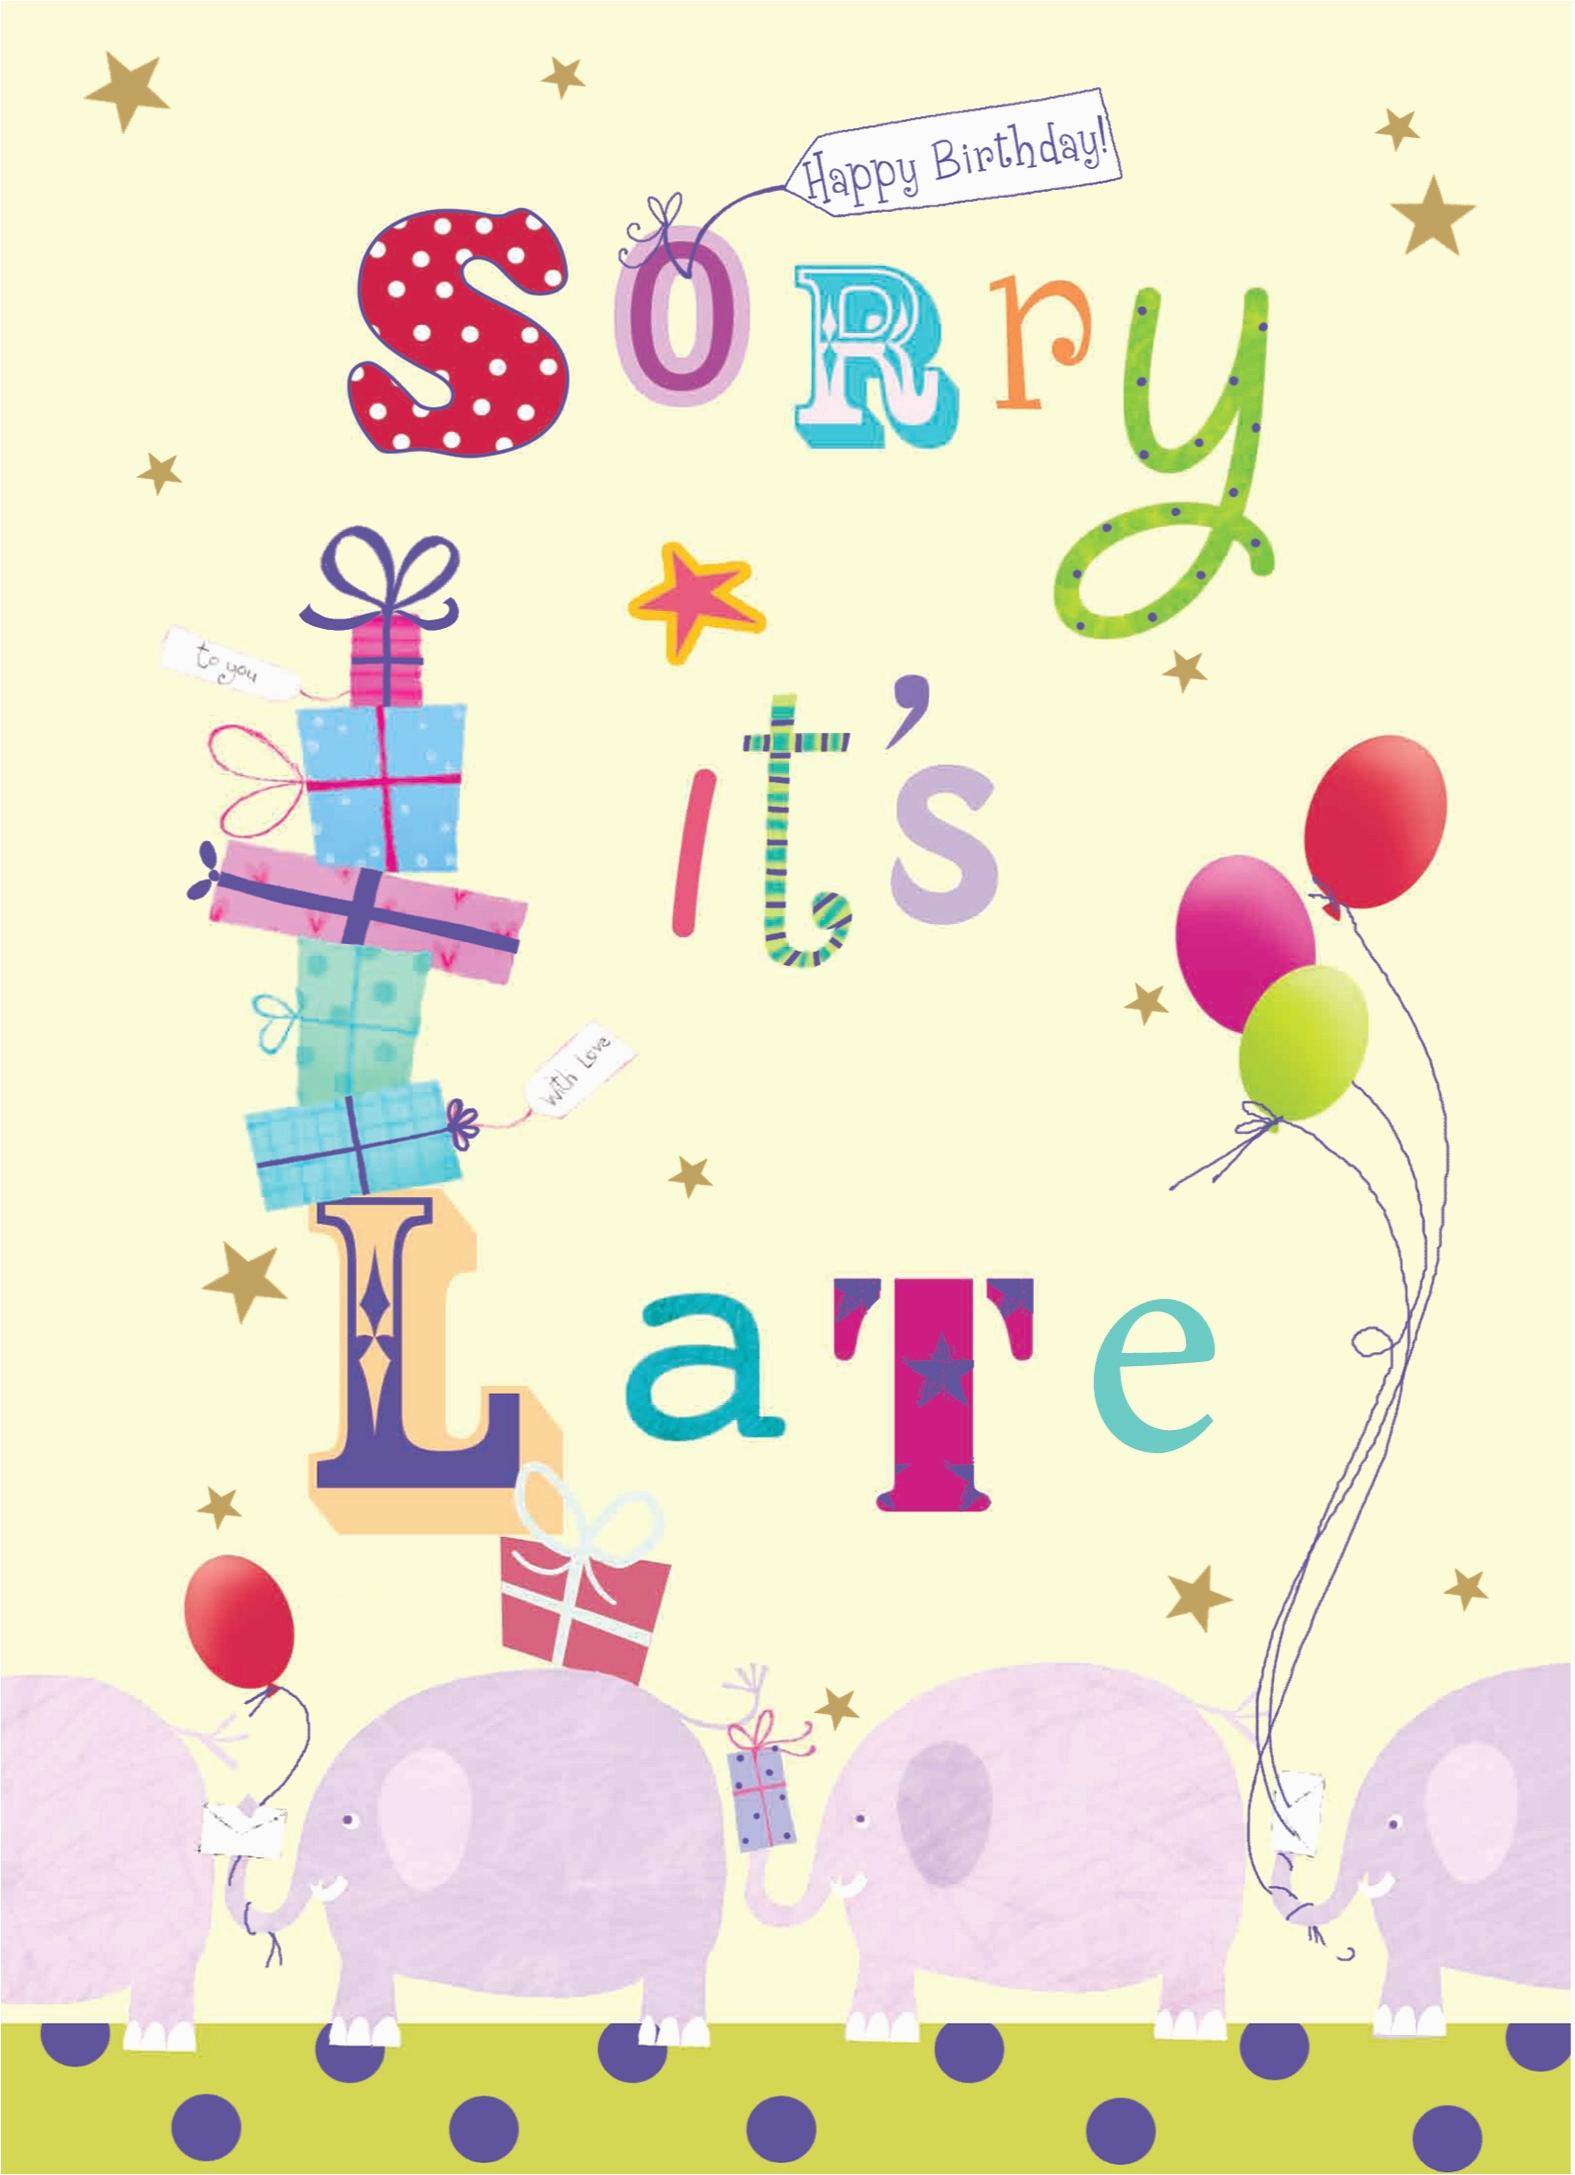 automatic birthday card sending service best happy